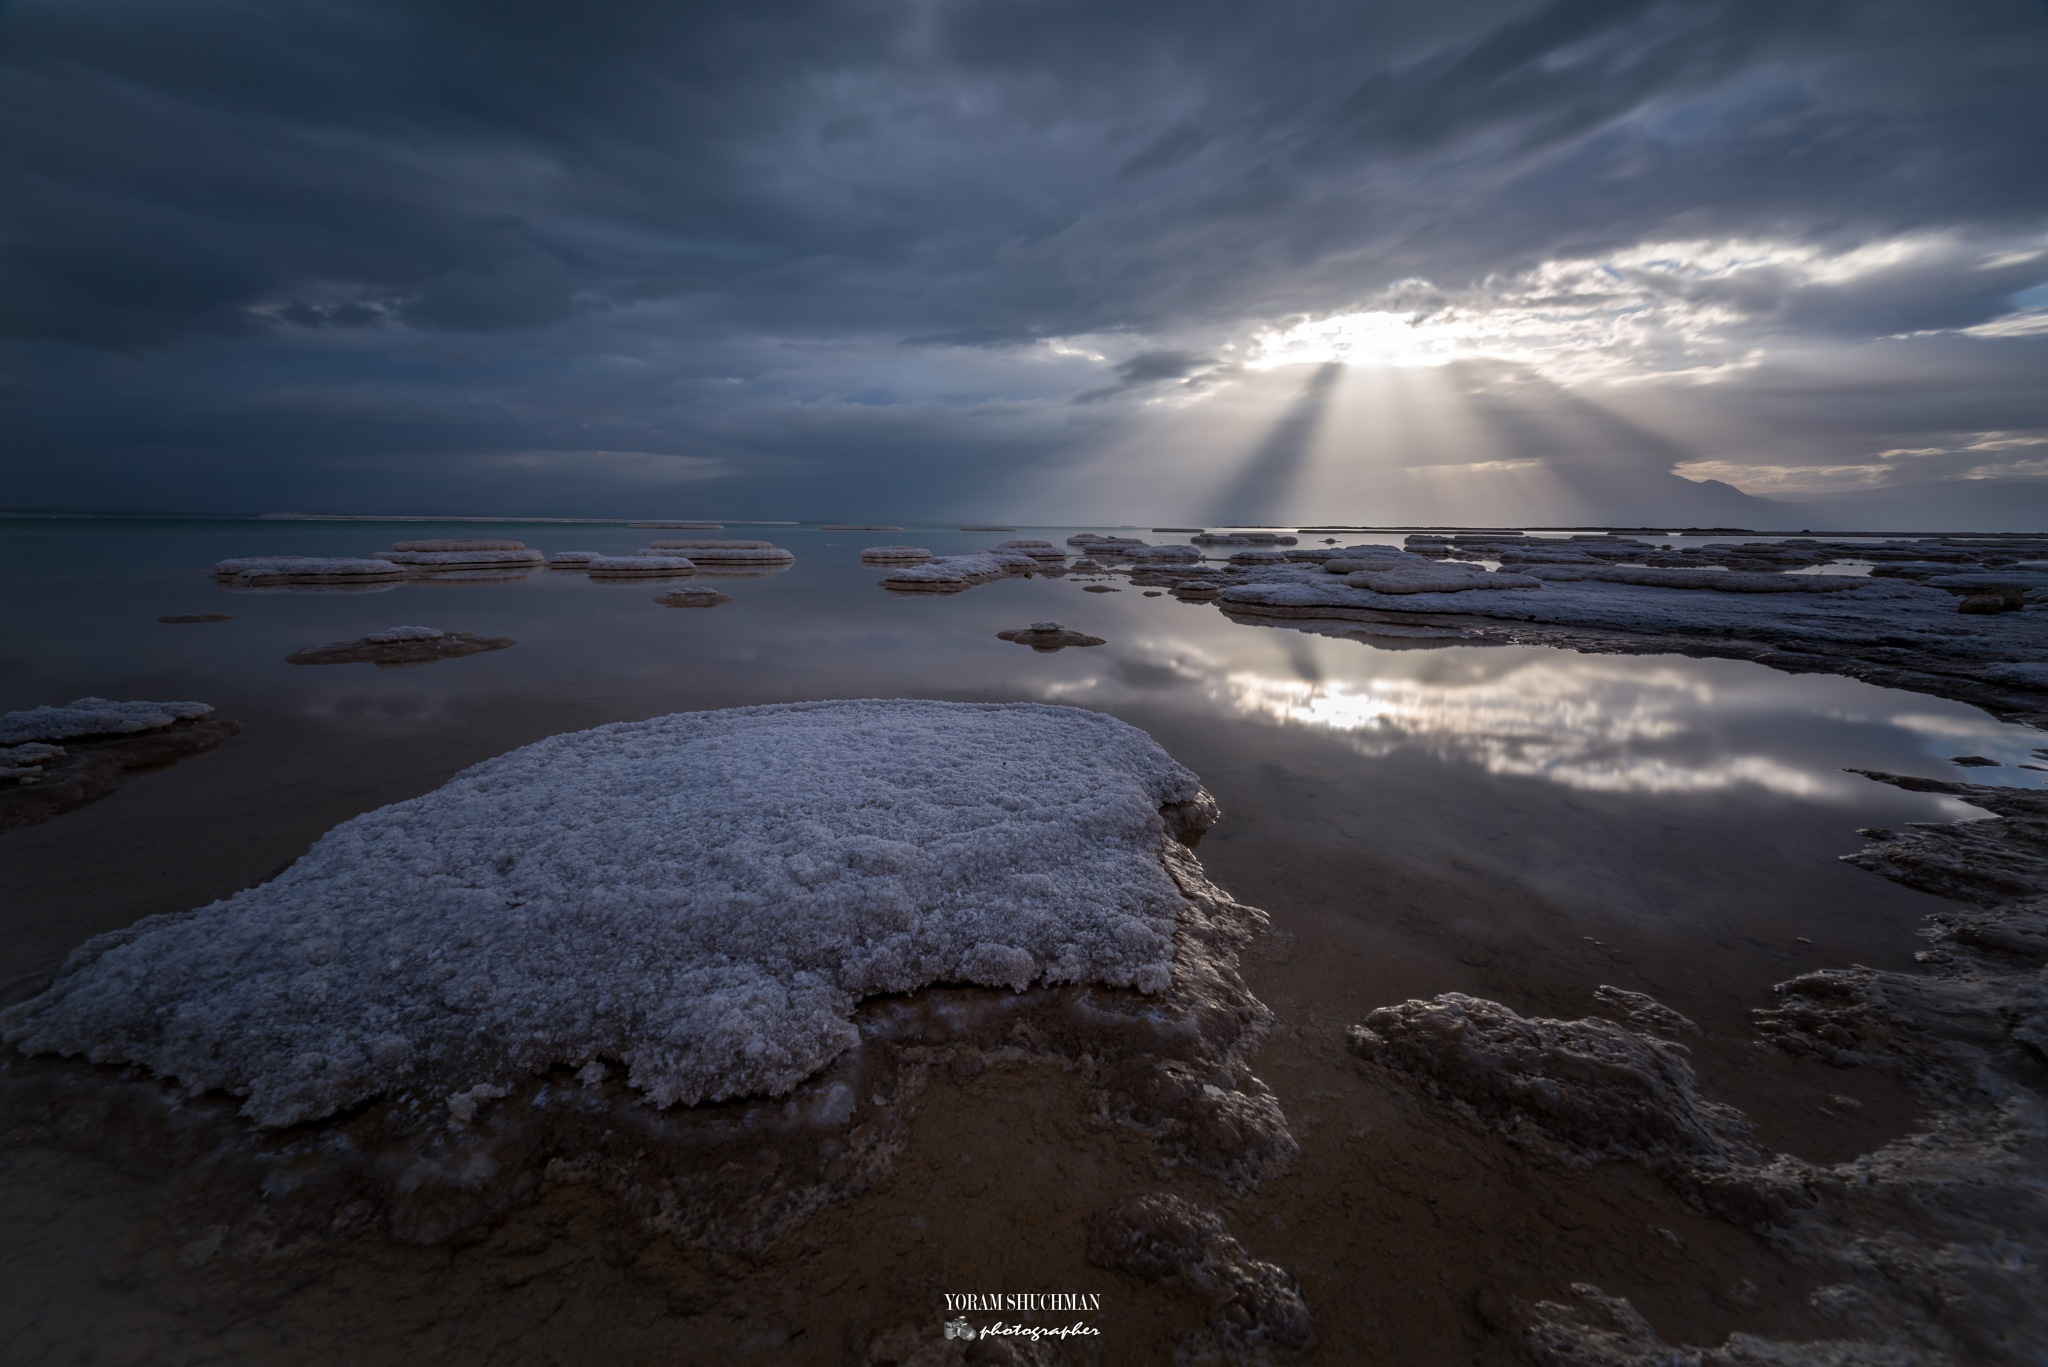 Sunrise at the Dead Sea by yoram.shuchman